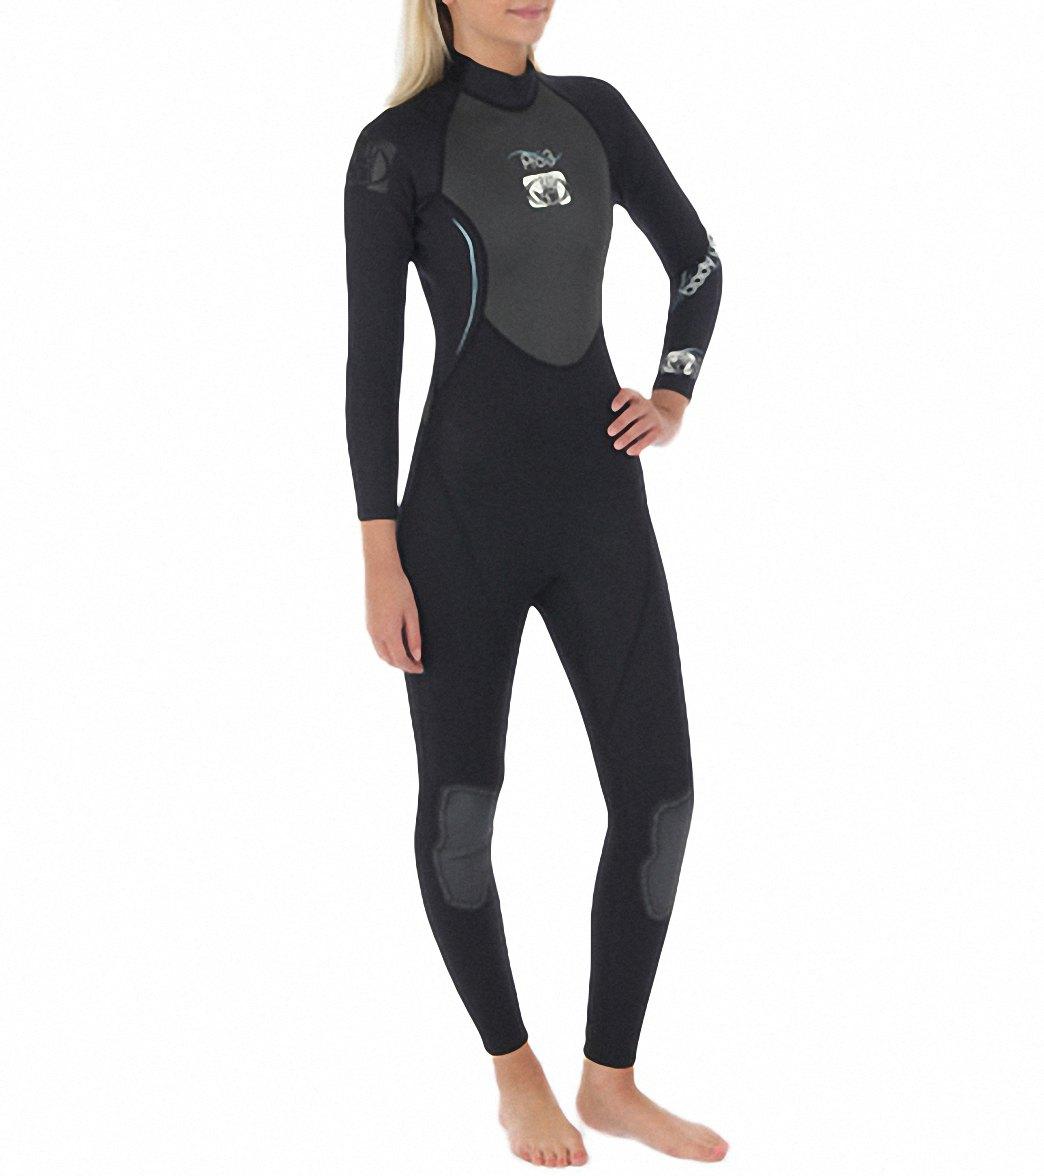 e7bfa5250ab Body Glove Women s Pro 3 3 2MM Back Zip Fullsuit Wetsuit at ...